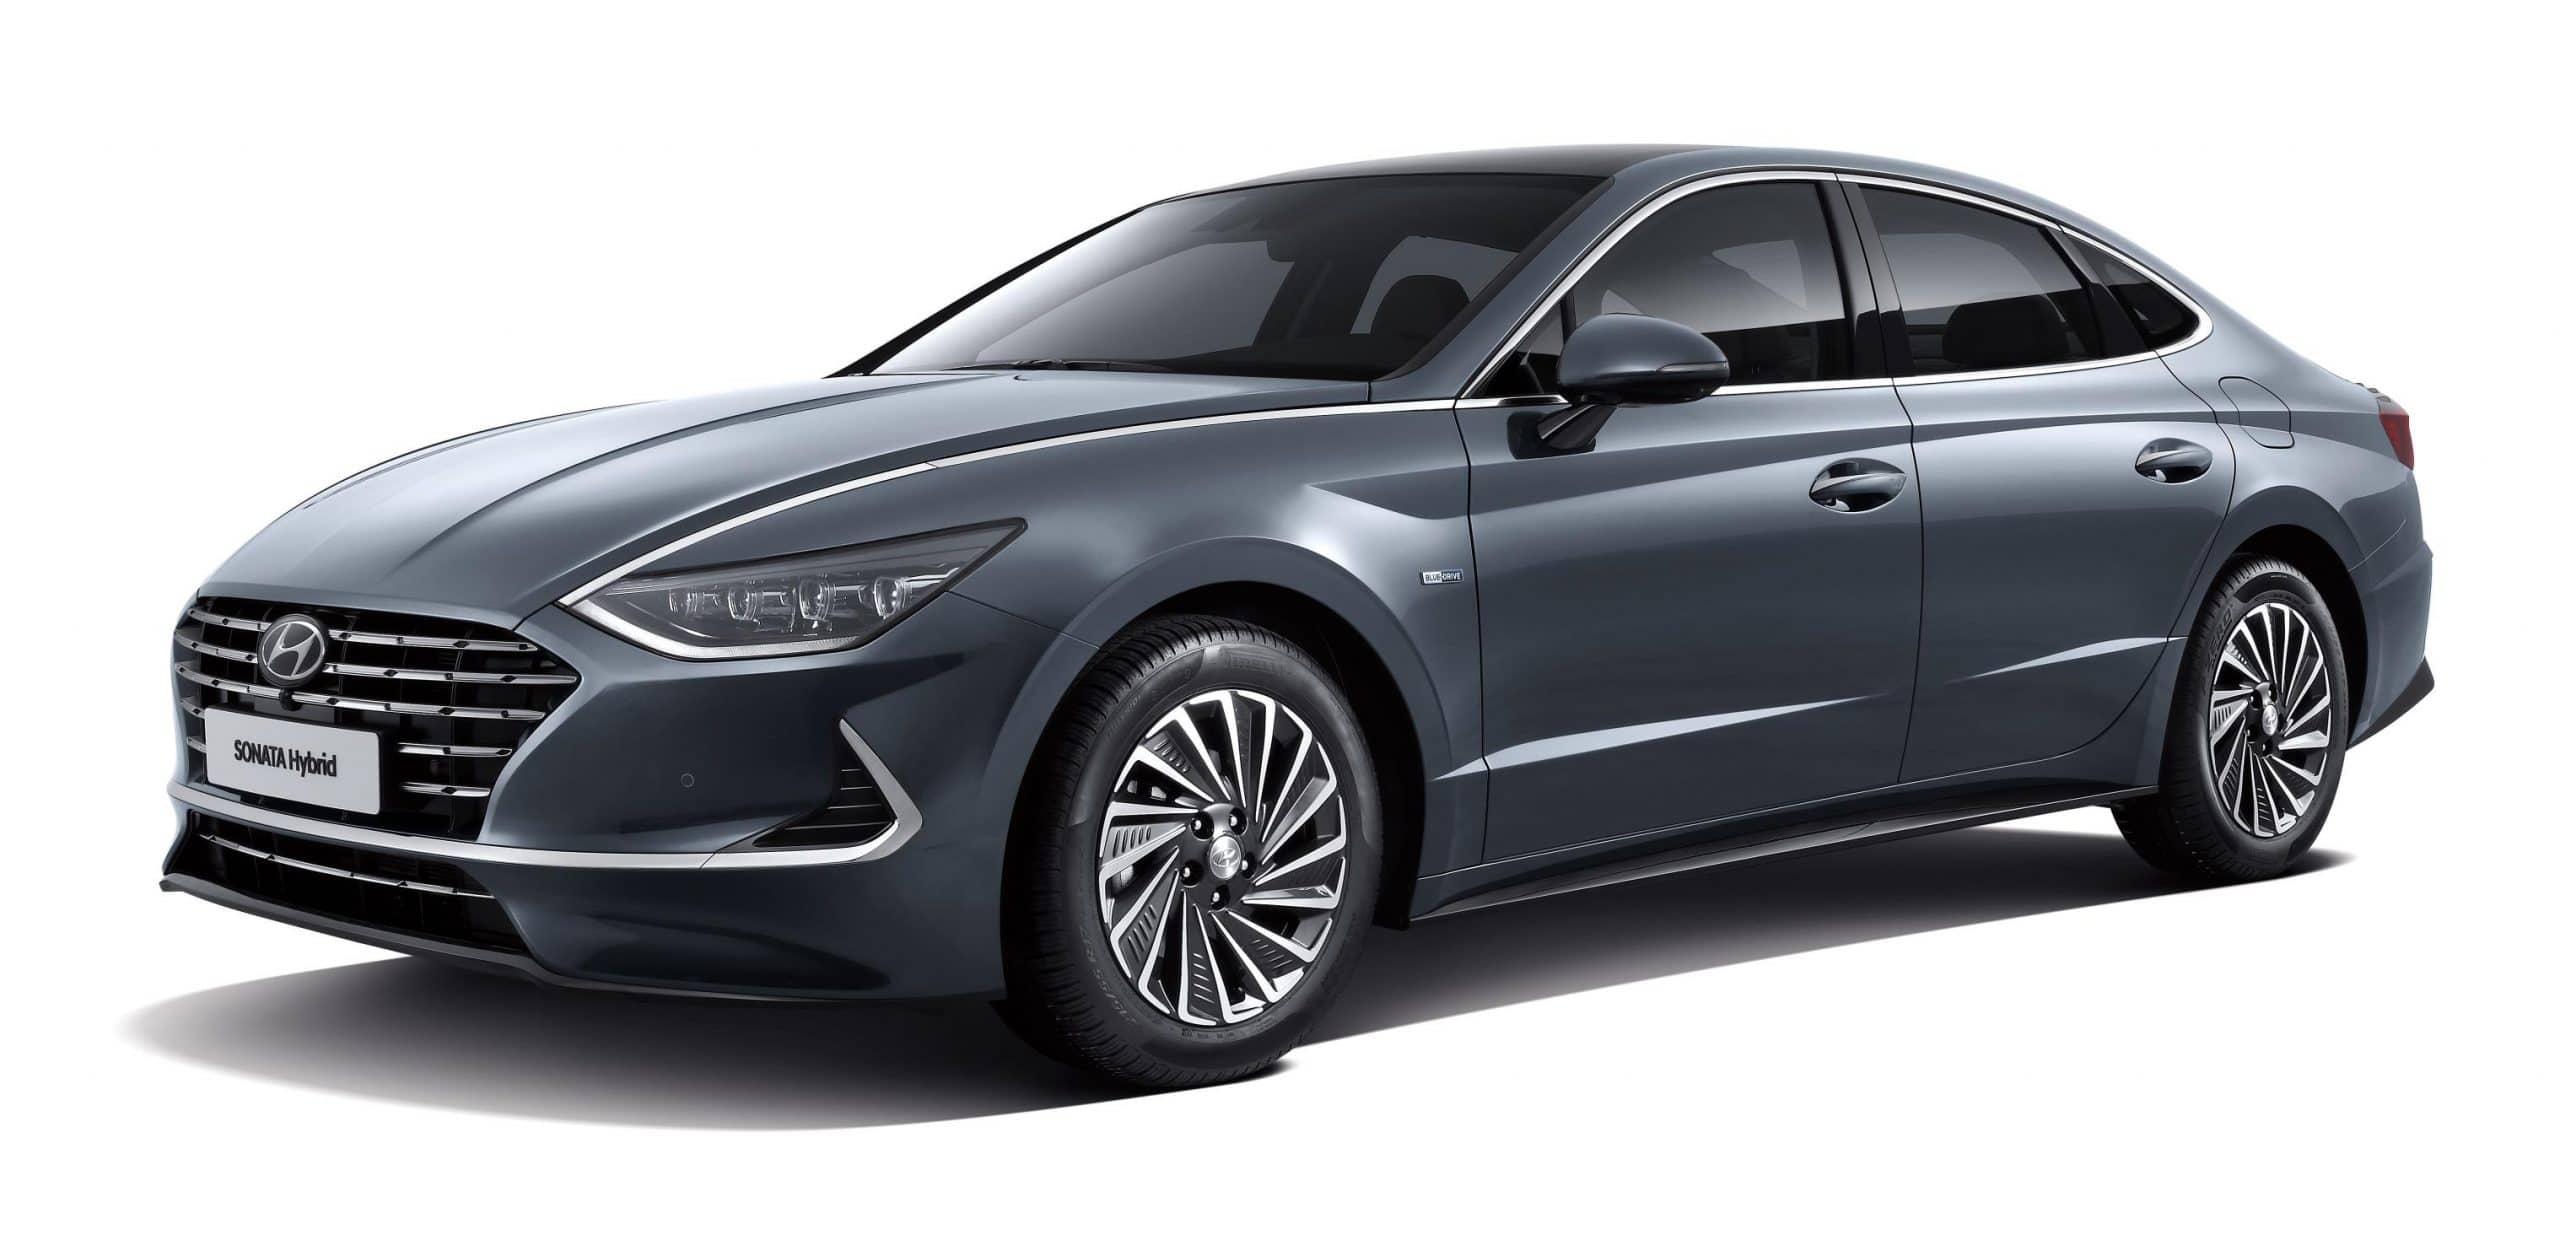 2021 Hyundai Sonata Hybrid Research New